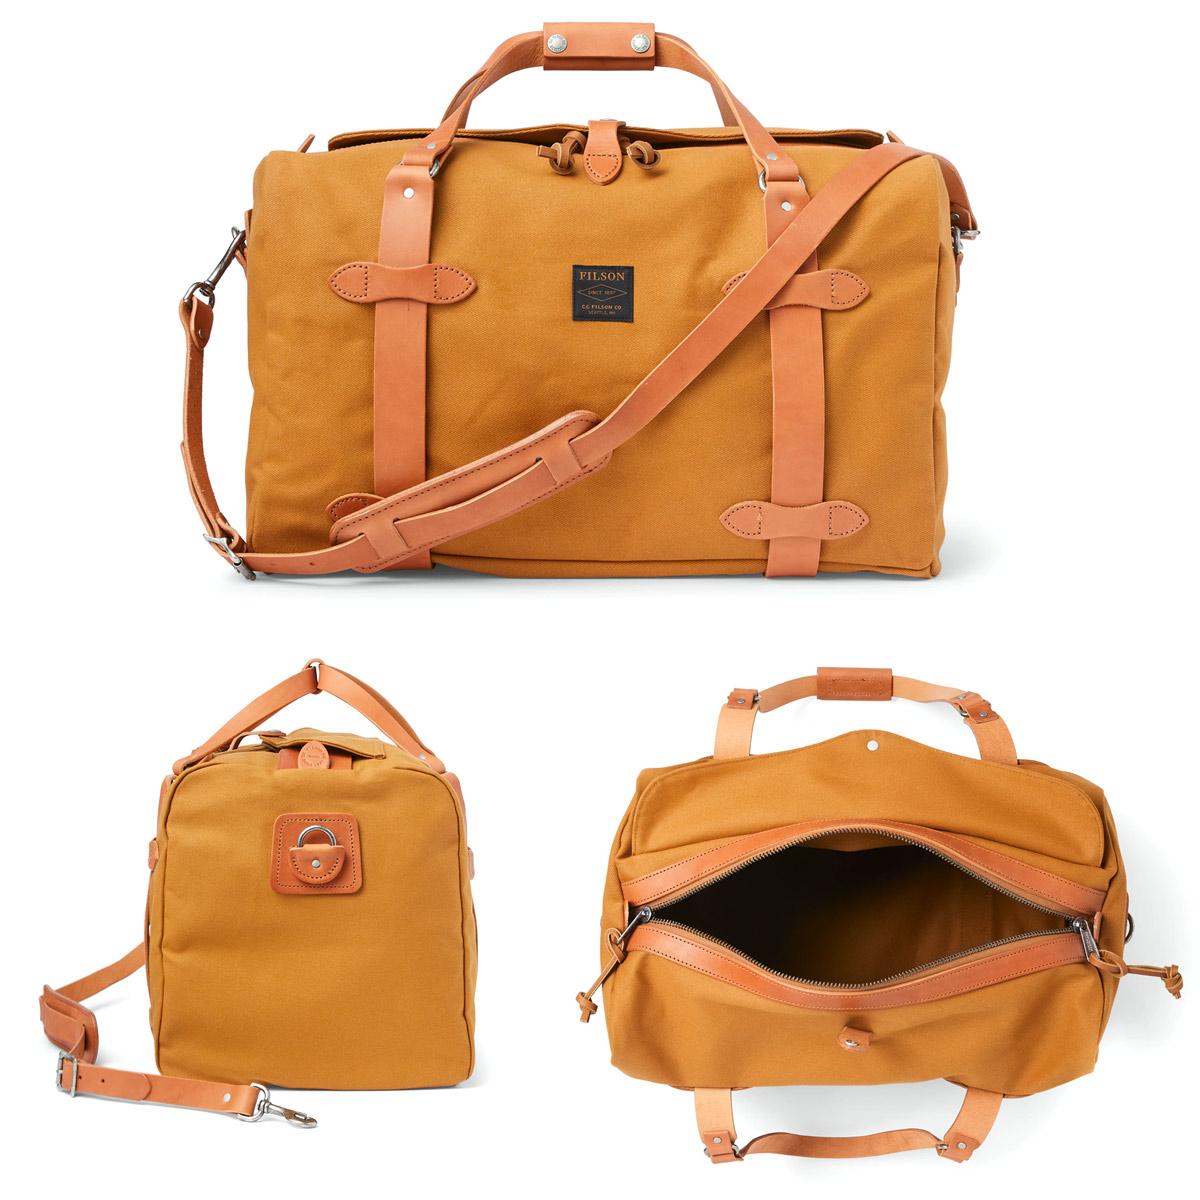 Filson Duffle Medium Chessie Tan, travelbag made for heavy-duty trips